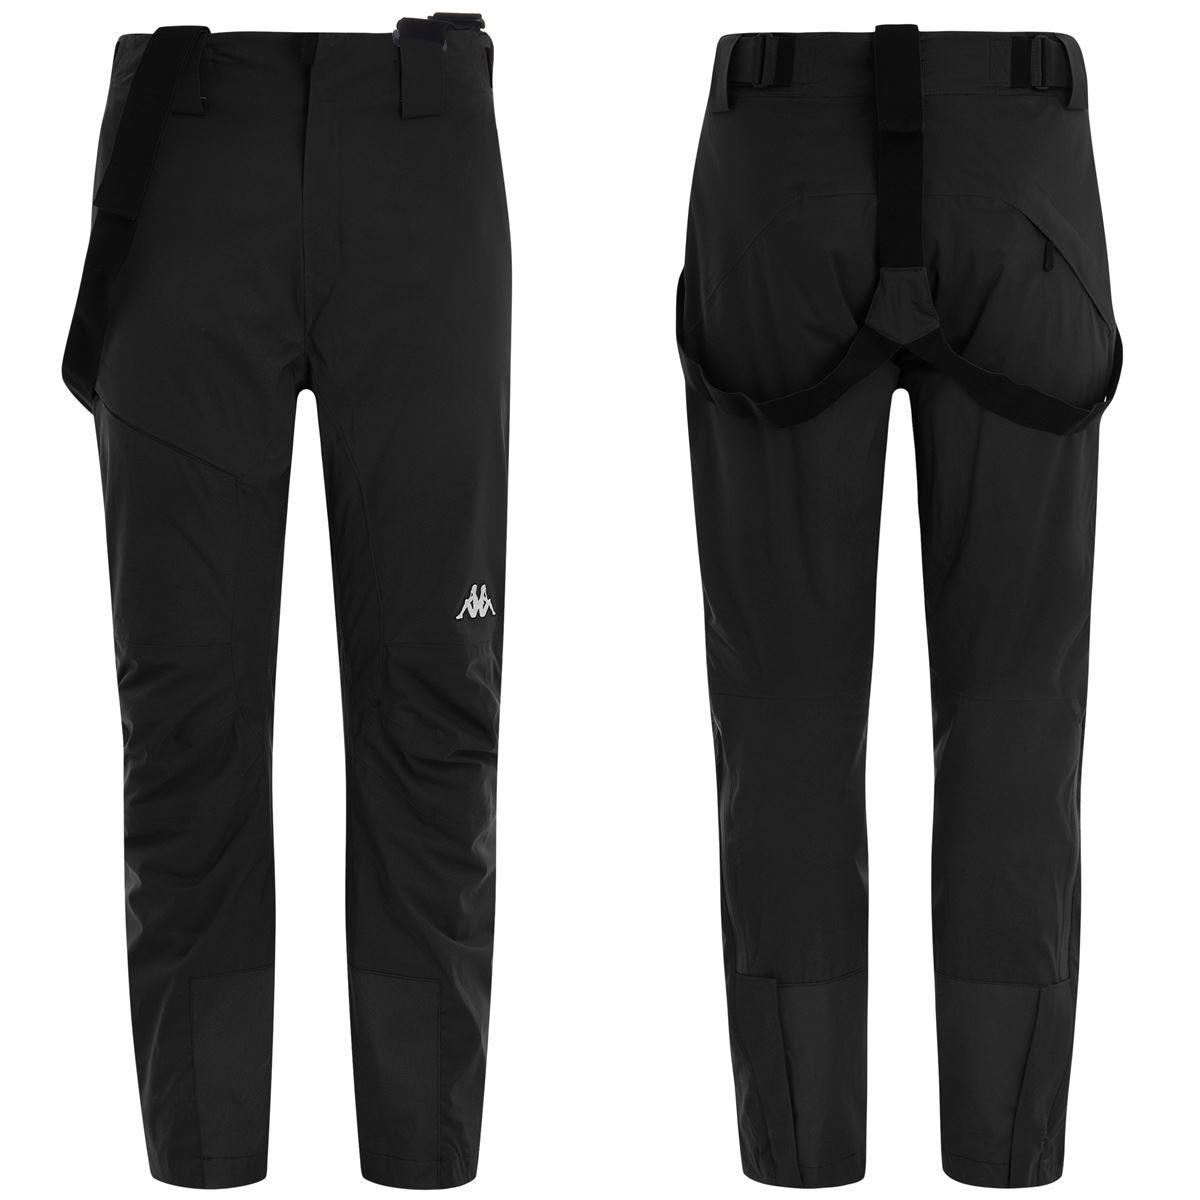 Kappa Pants 6CENTO 622A FULL ZIP Junior Boy Sport Trousers